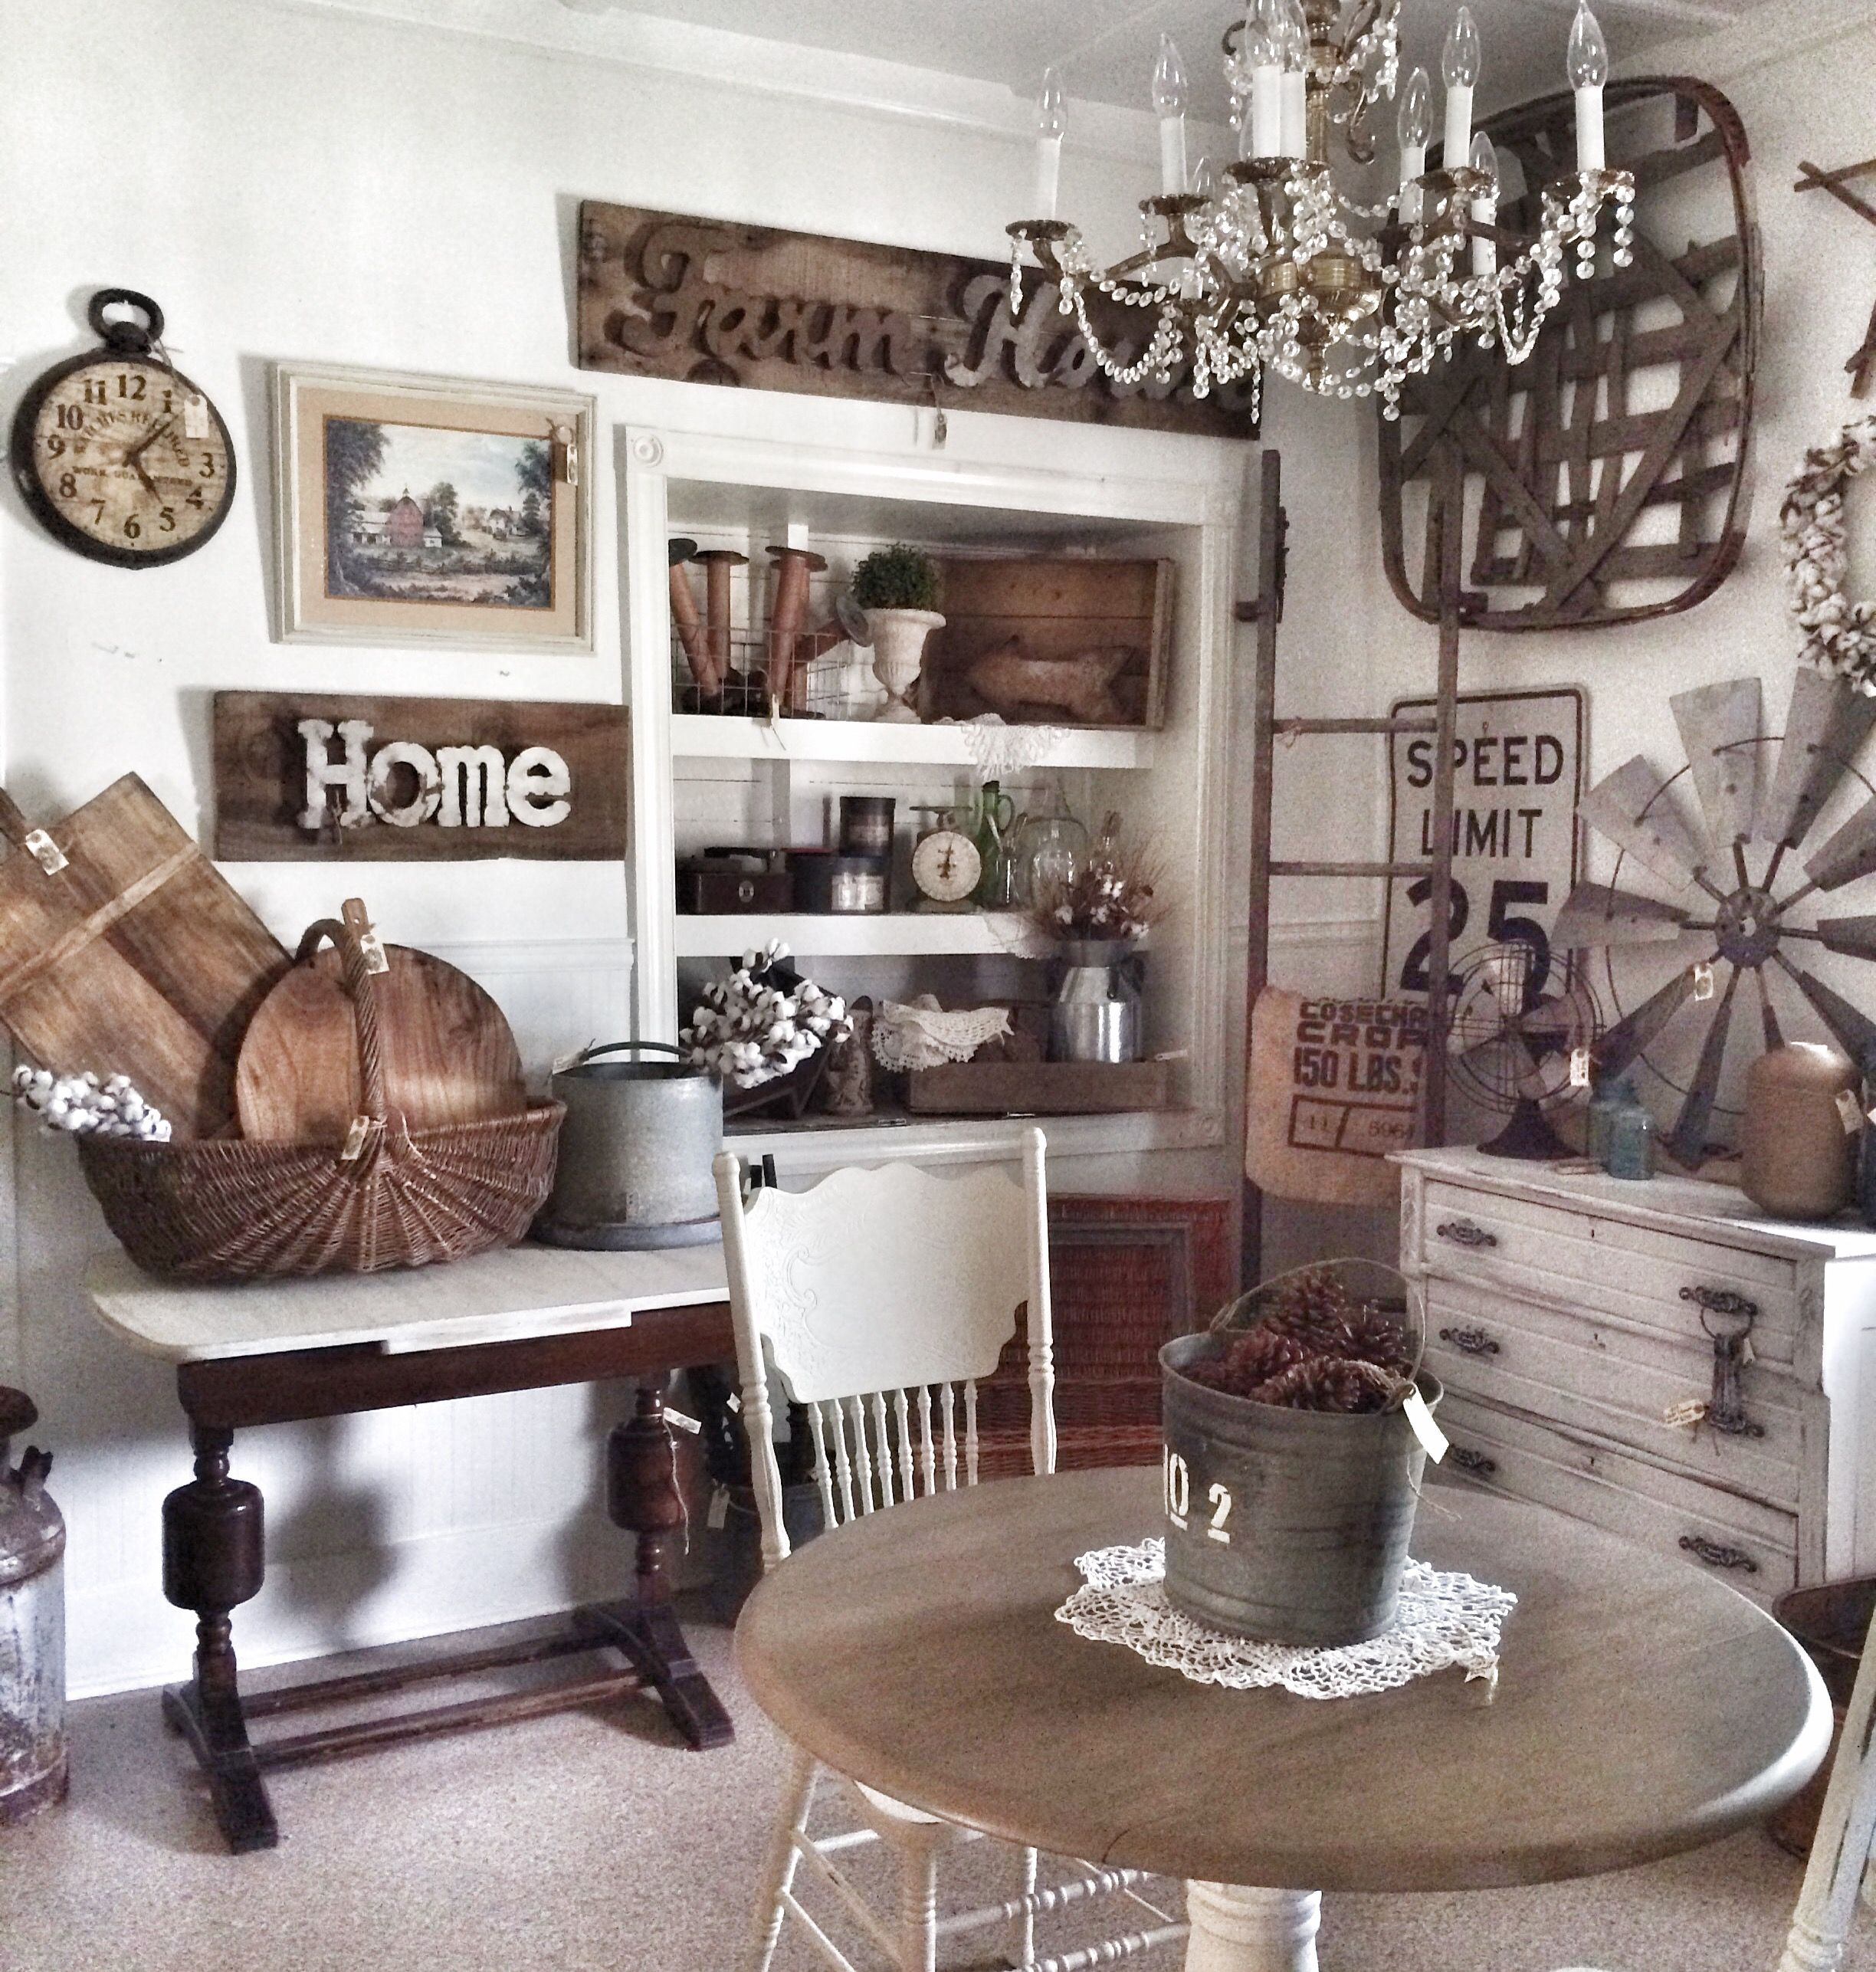 Farmhouse Booth Ideas Or Barn Sale Ideas Tobacco Basket Decor Antique Booth Ideas Home Decor